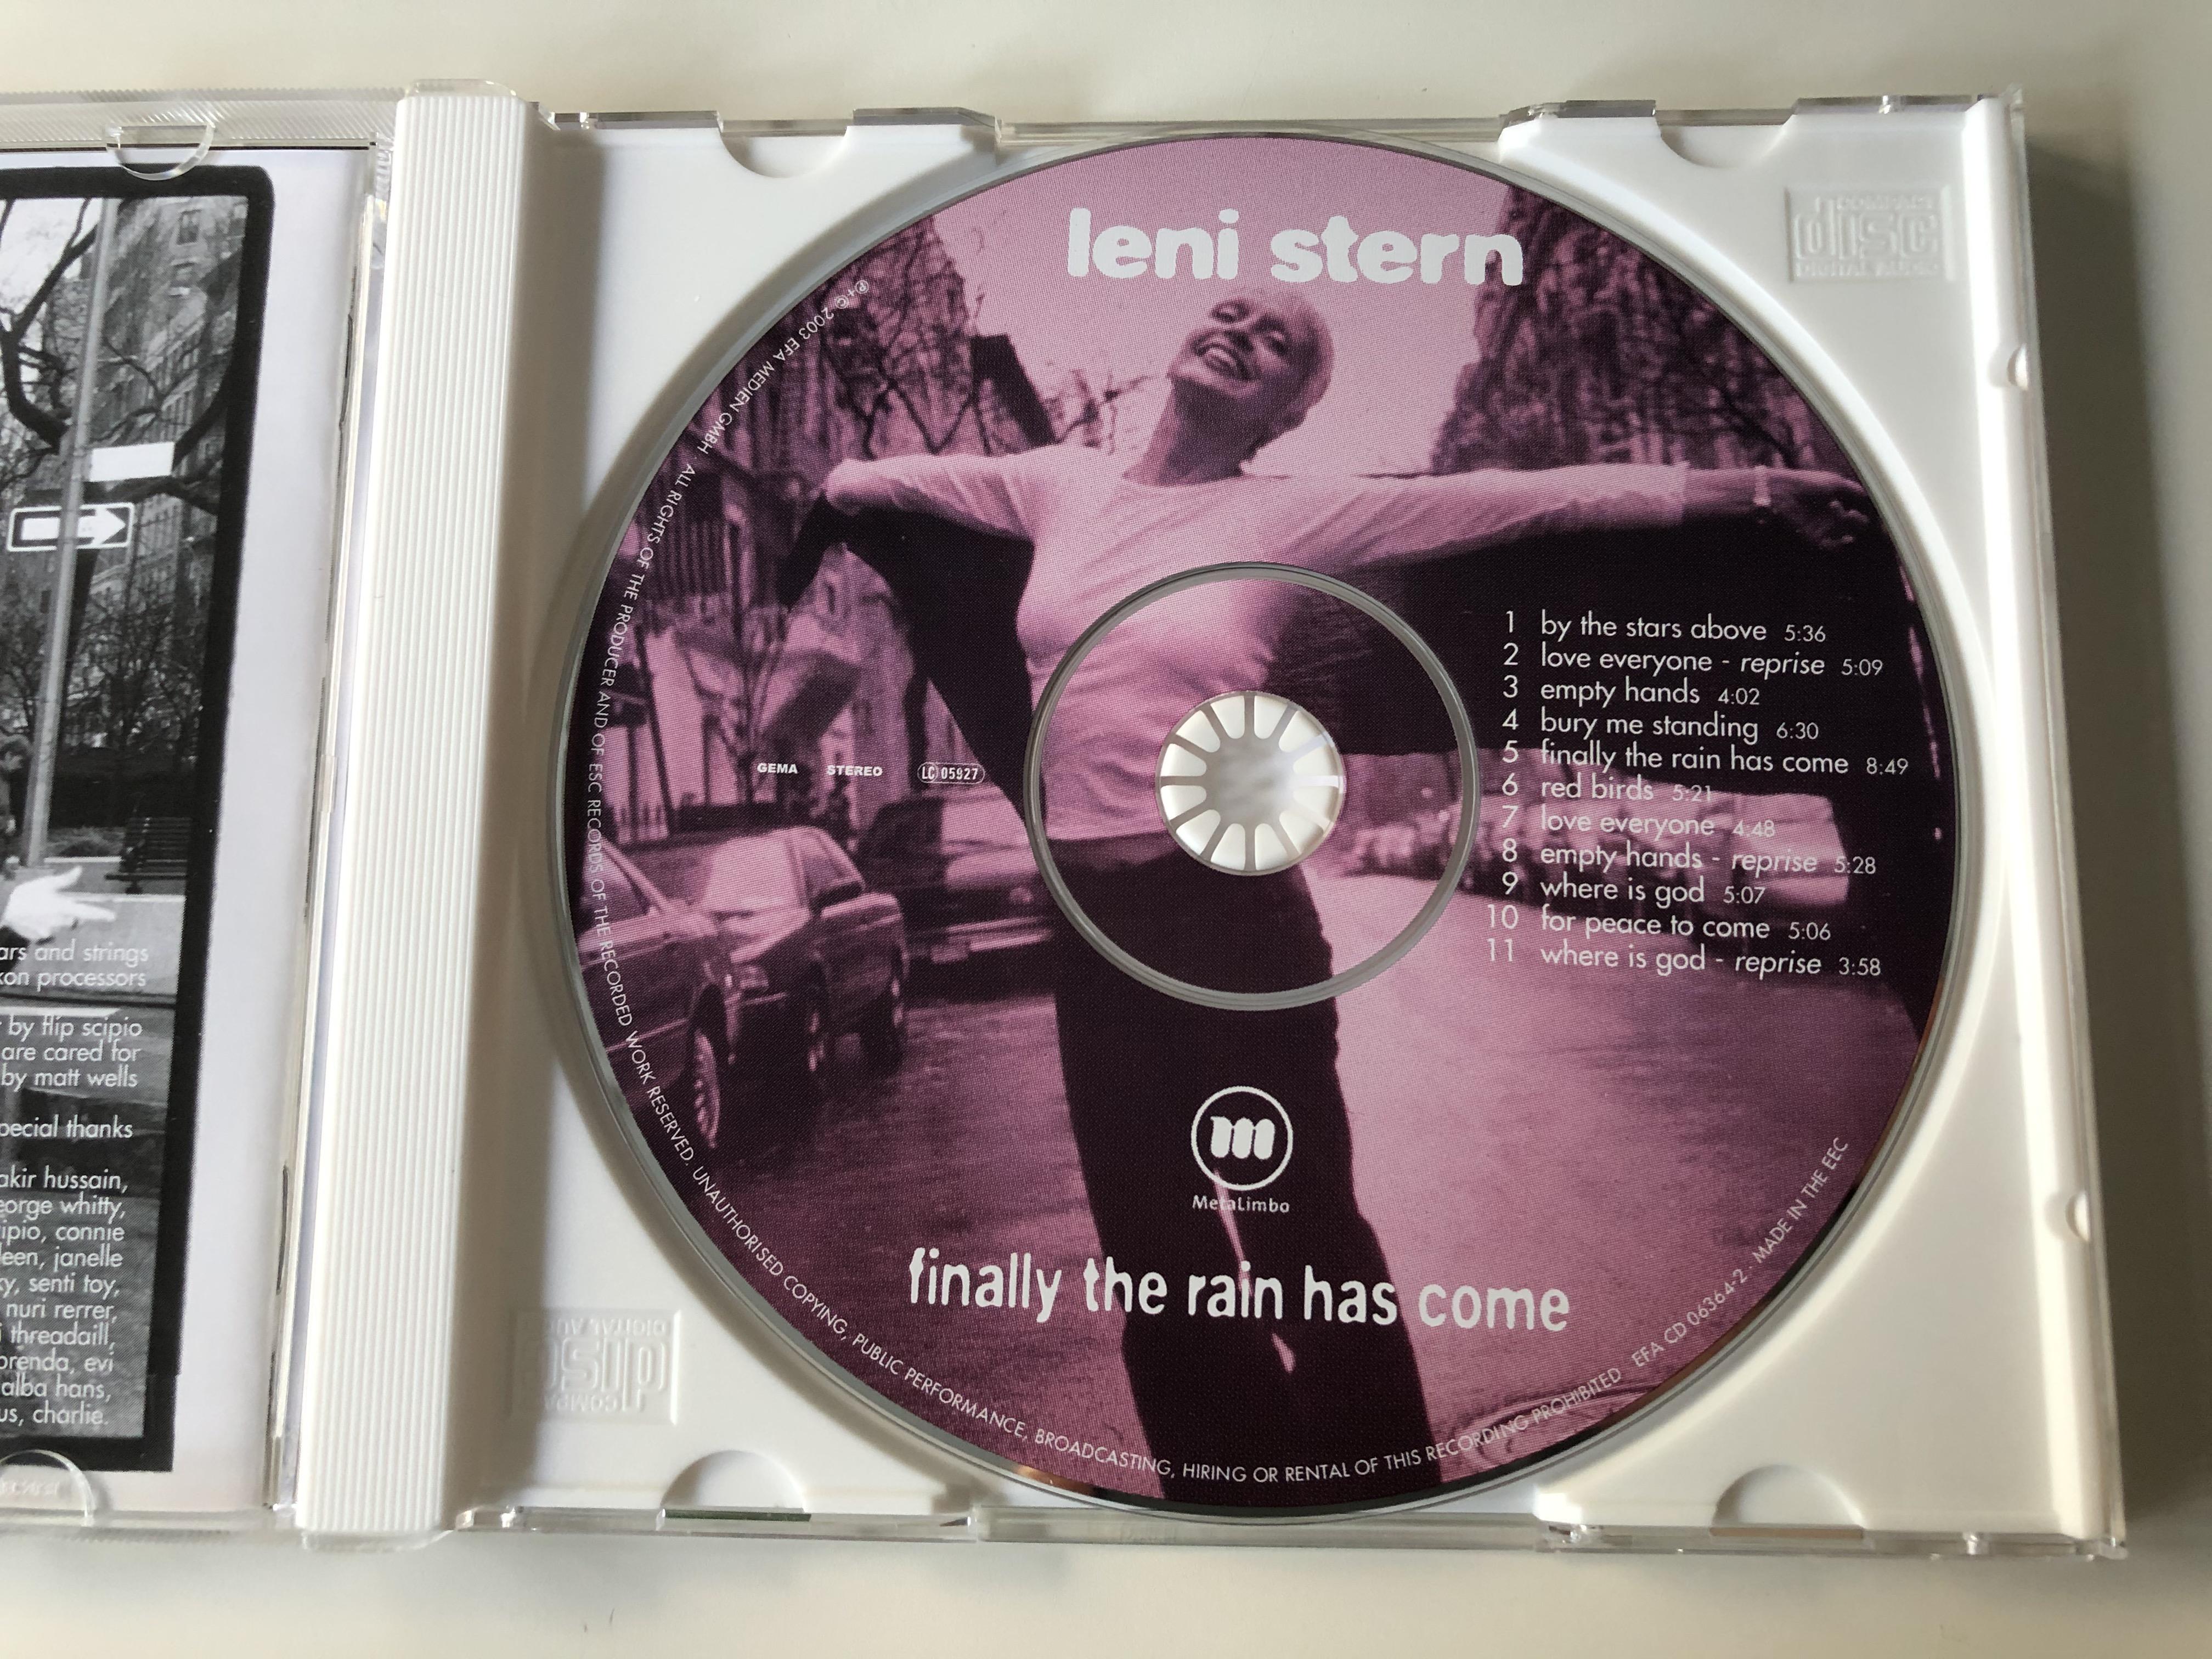 leni-stern-finally-the-rain-has-come-metalimbo-records-audio-cd-2003-efa-cd-06364-2-8-.jpg